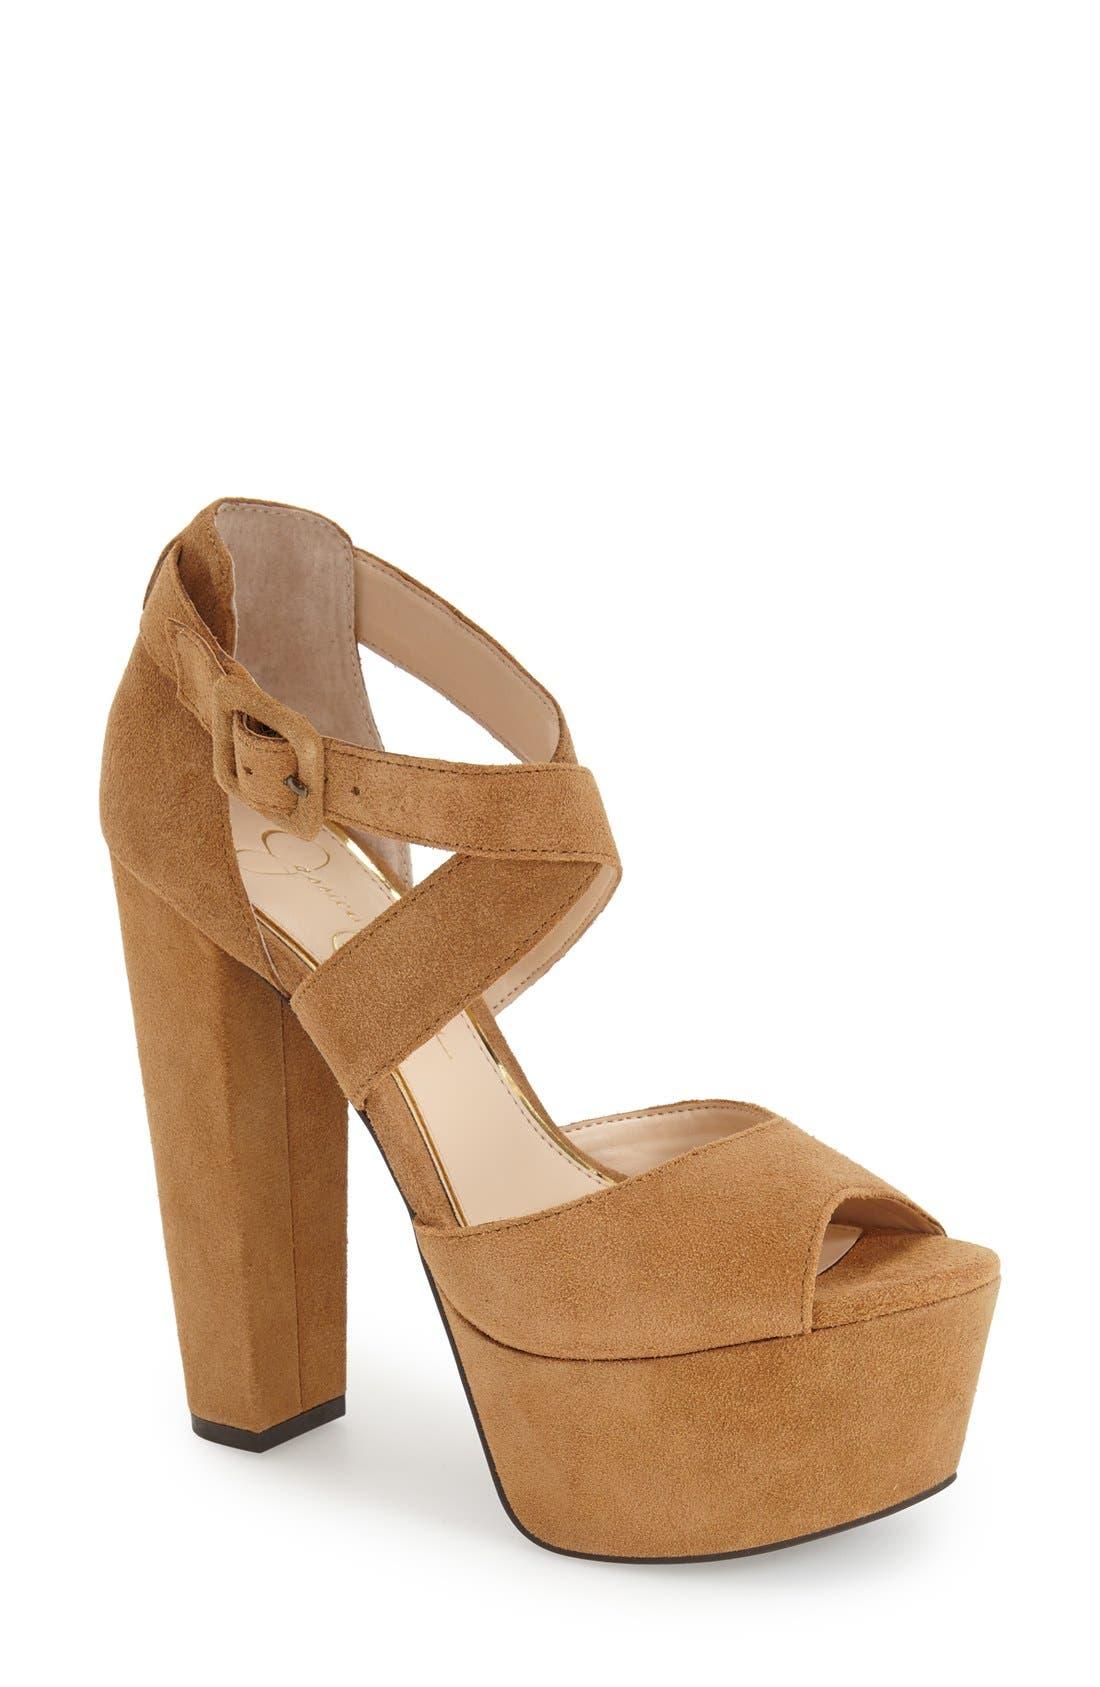 Alternate Image 1 Selected - Jessica Simpson 'Derian' Platform Sandal (Women)